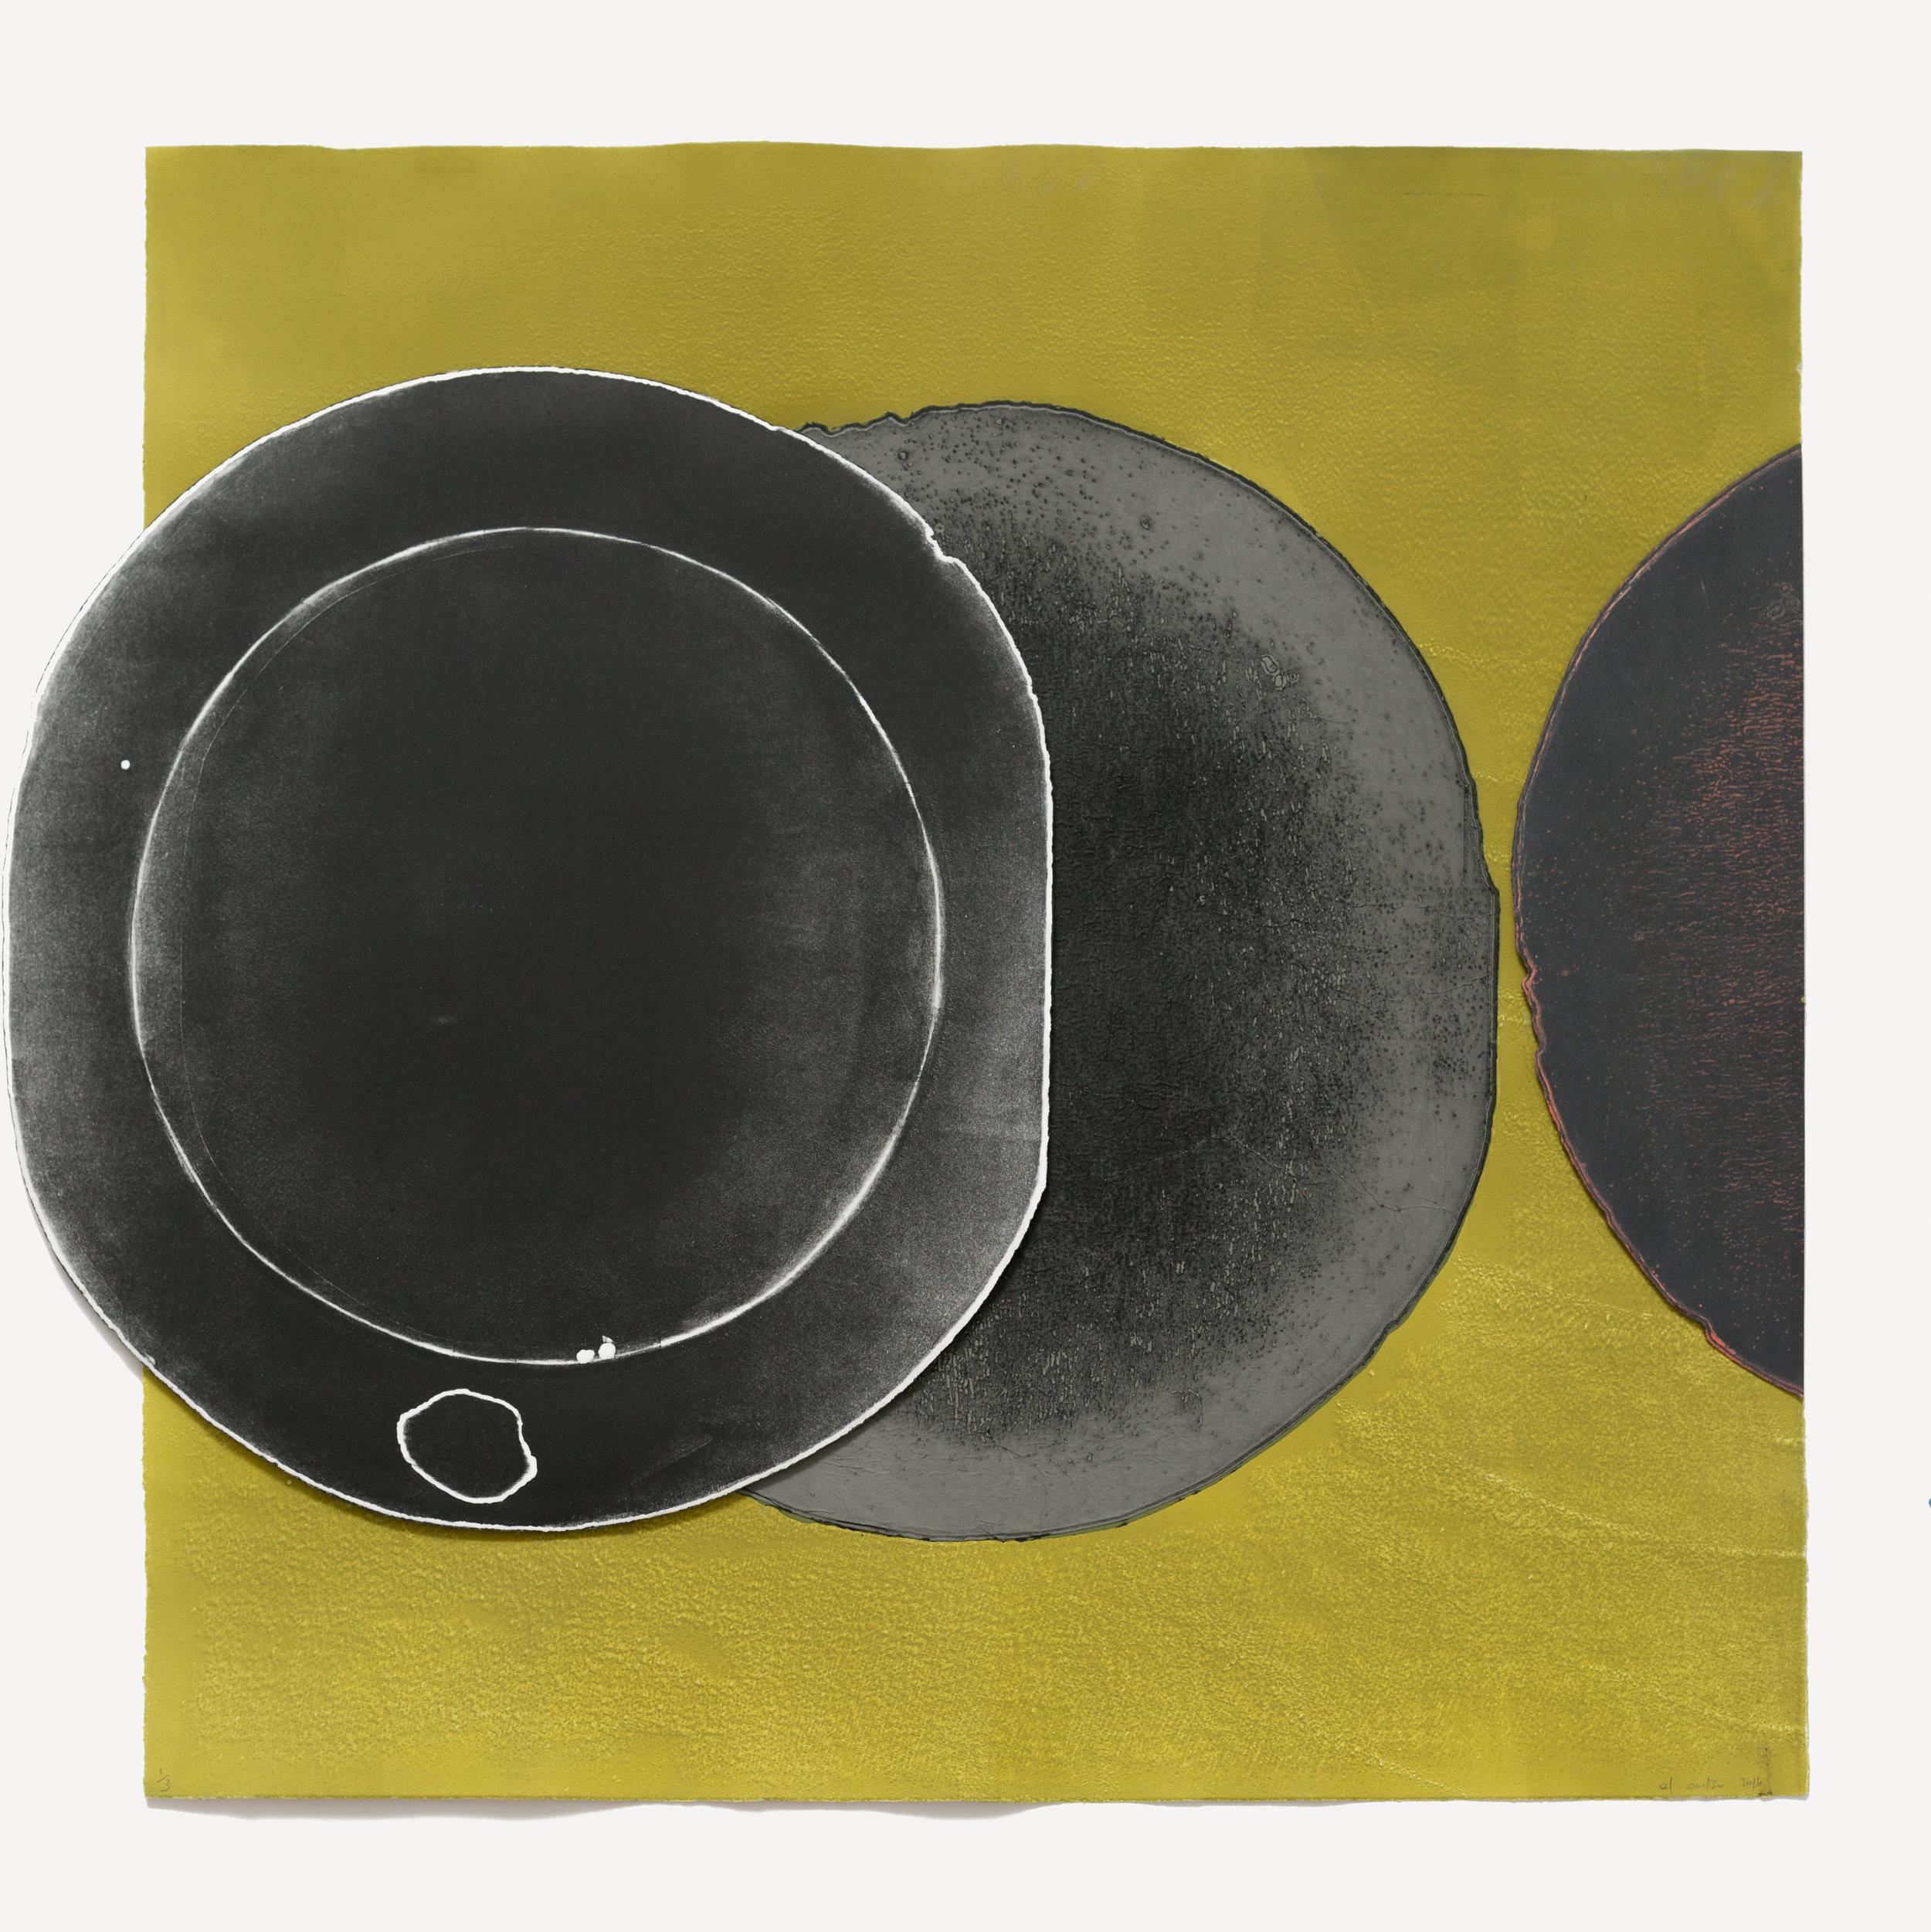 El Anatsui  Sage Grey Eclipse,  2016 Intaglio print with collage and chine-collé 98.5 x 98.5 cm Edition 1/3